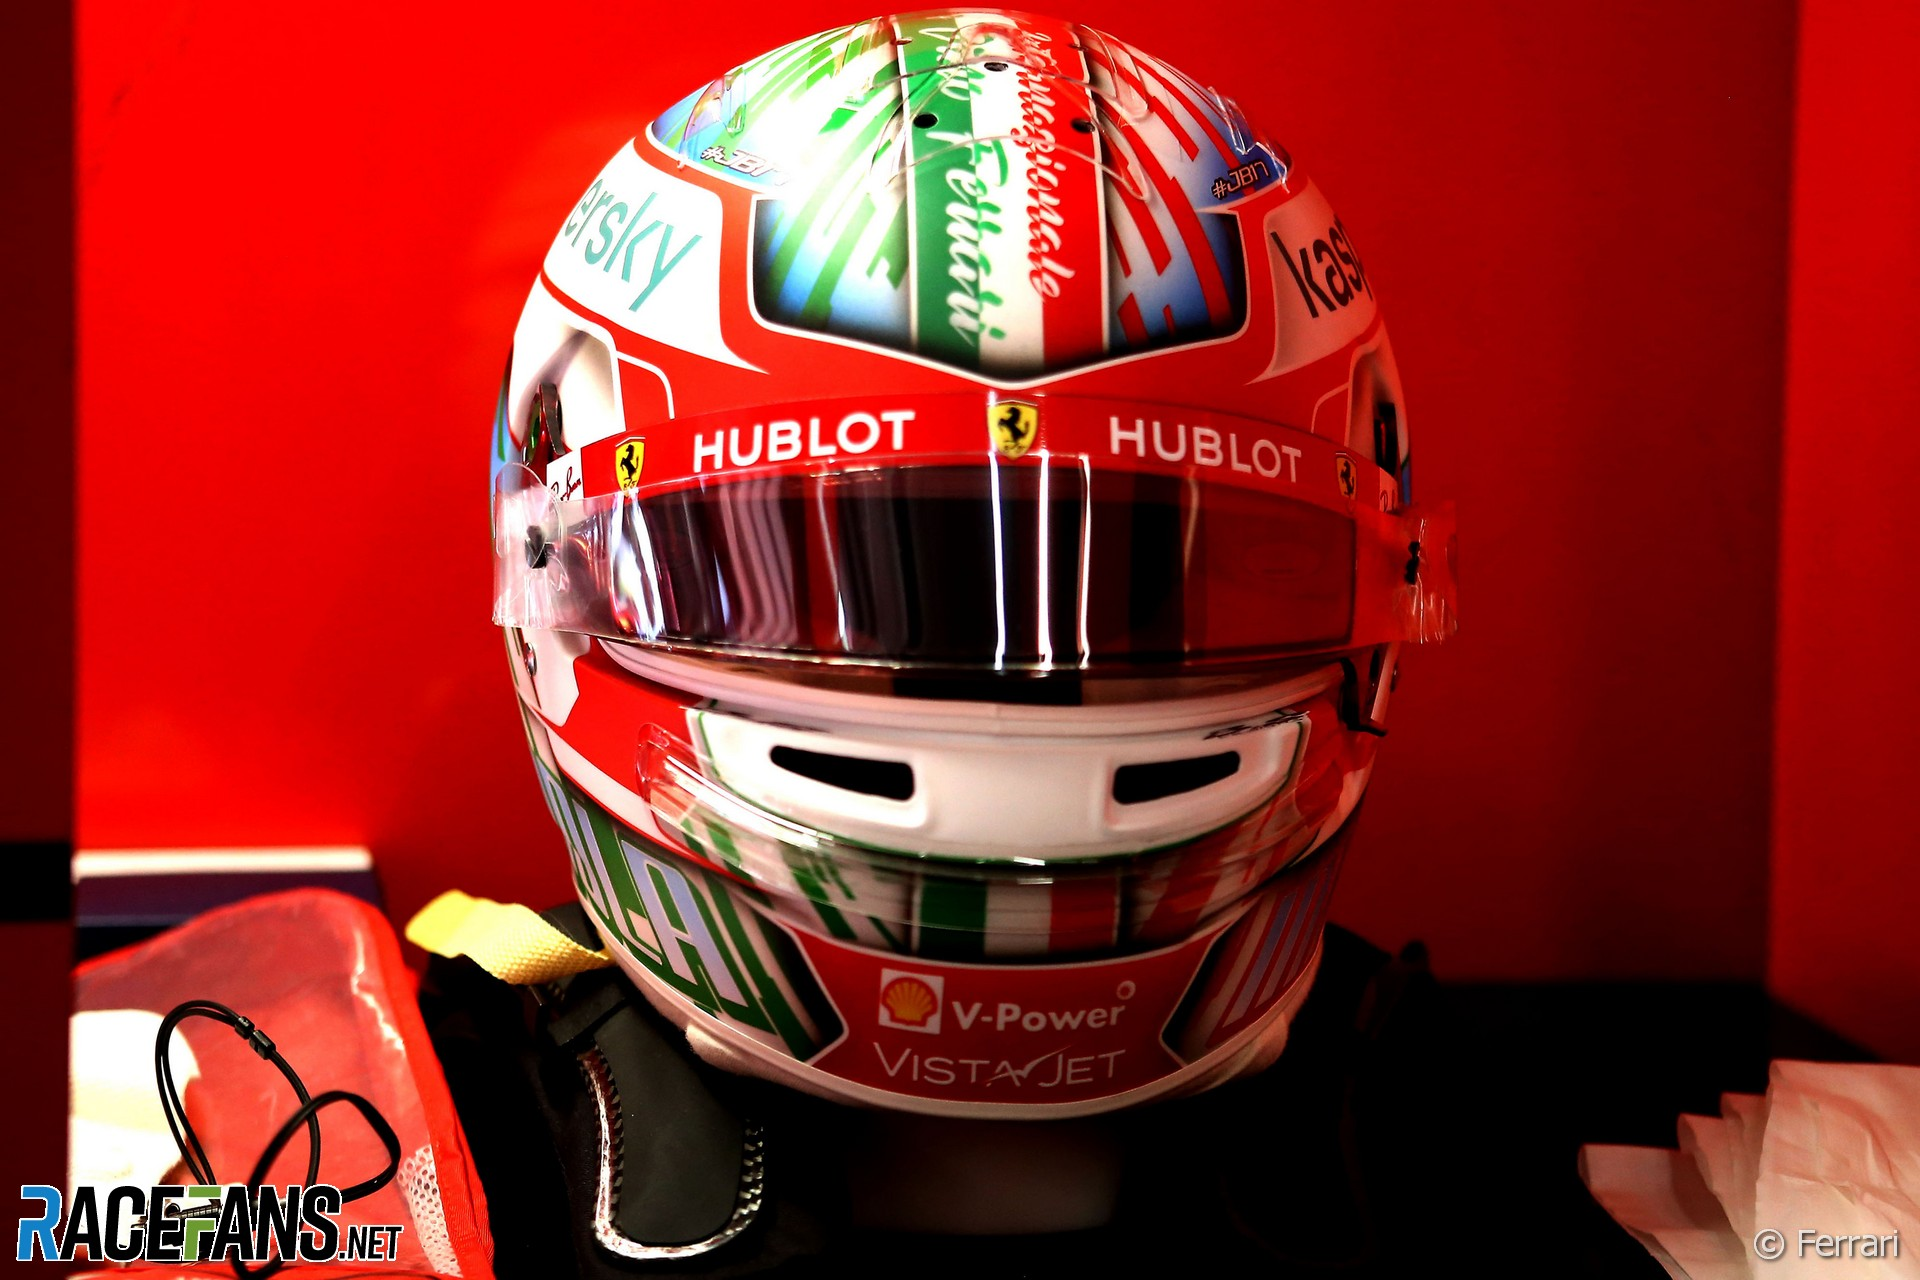 Charles Leclerc's Emilia-Romagna Grand Prix helmet, 2020